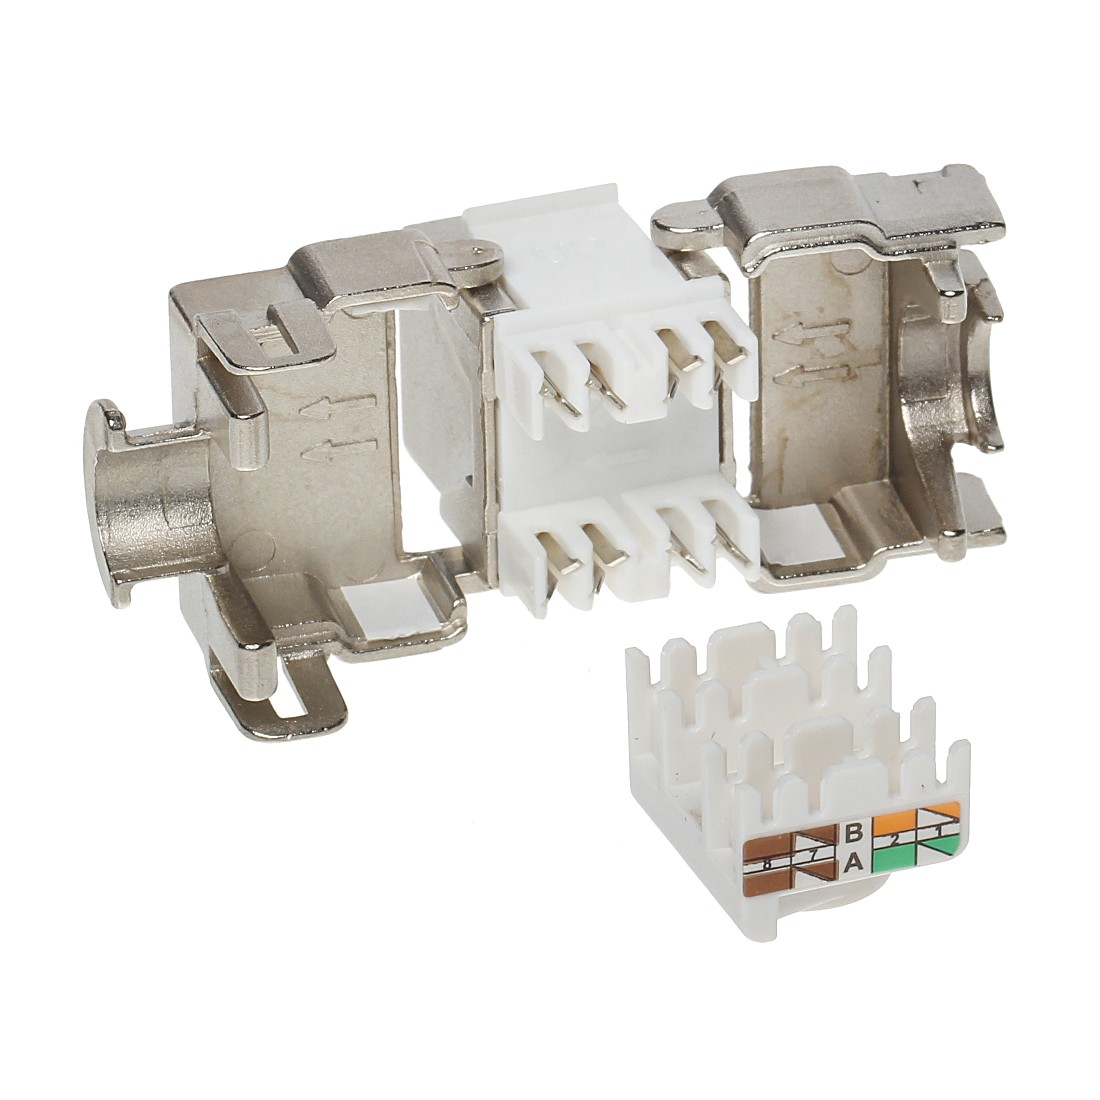 KONEKTOR KEYSTONE FX-RJ45-6A-01